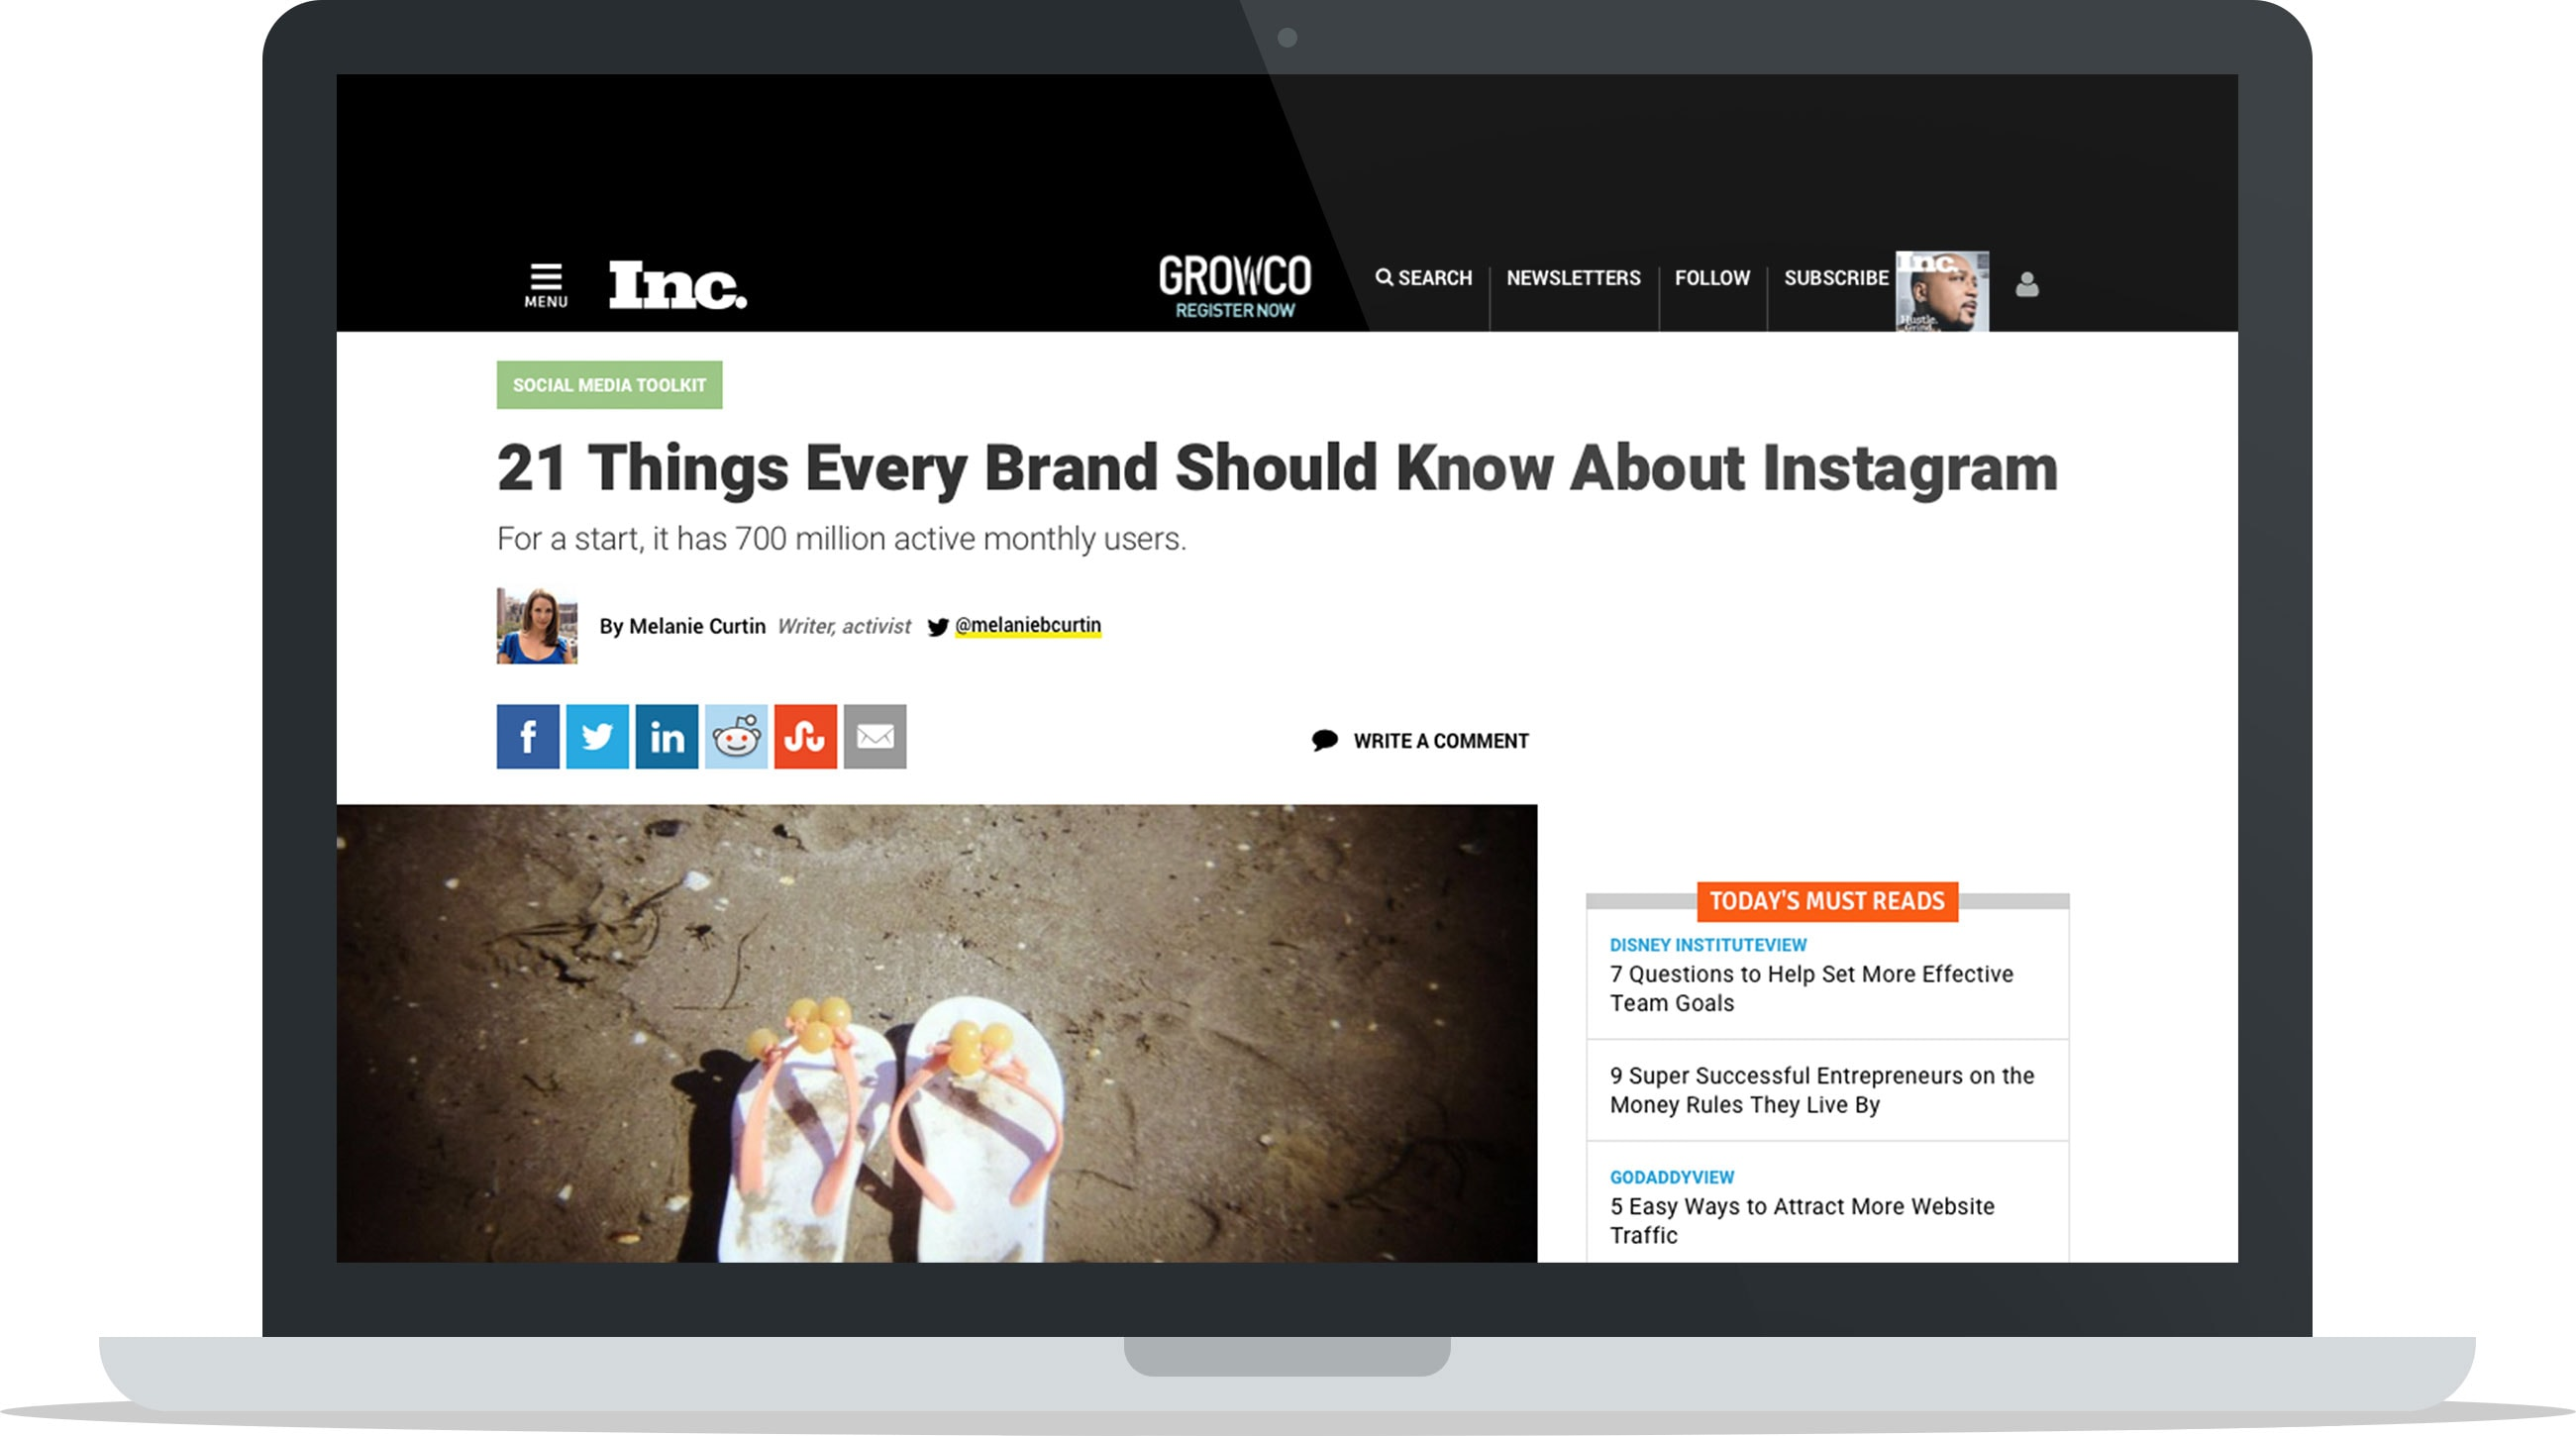 Advantages & Disadvantages of Instagram